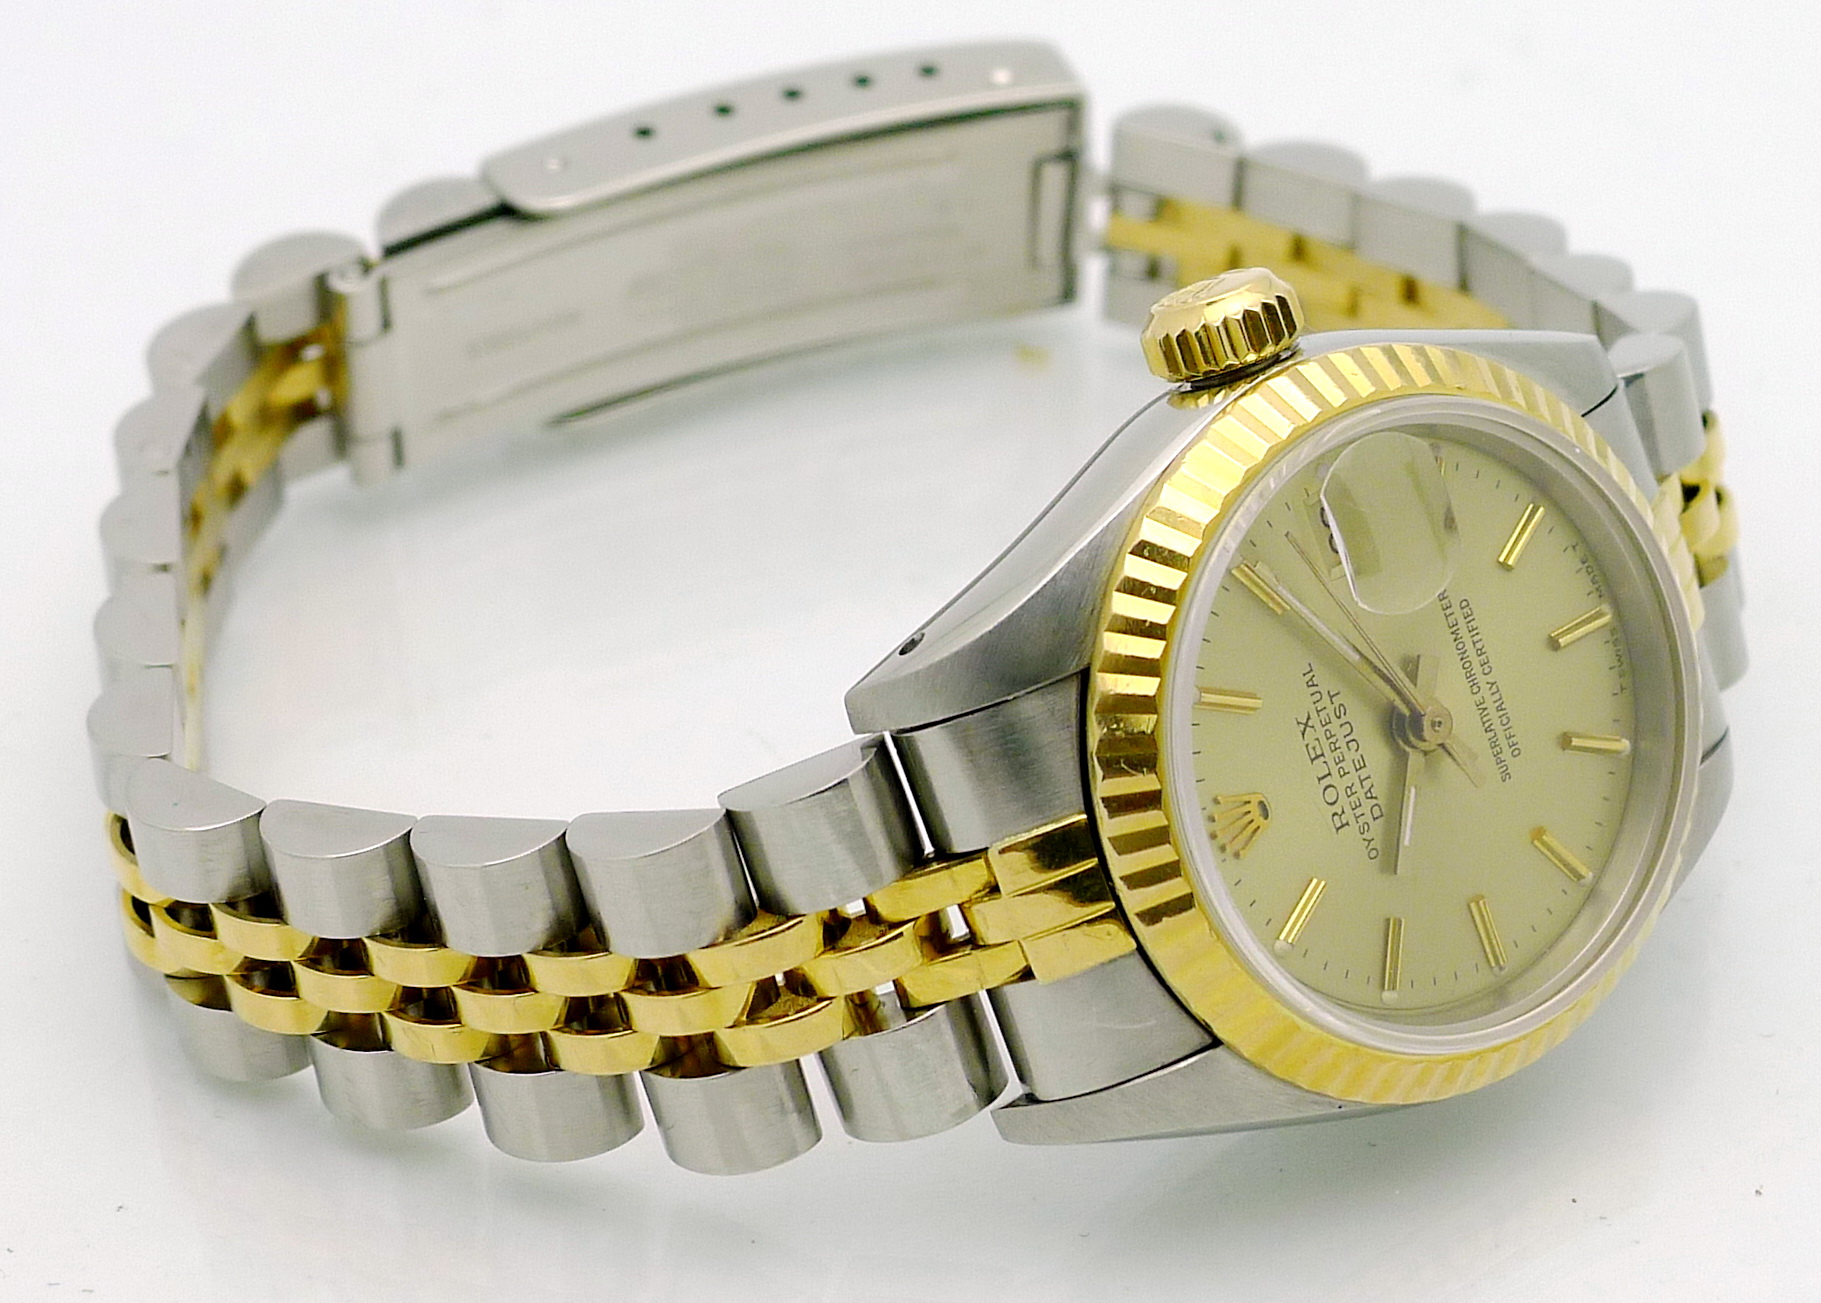 luxus rolex jubilee armband stahl gold schmuck website. Black Bedroom Furniture Sets. Home Design Ideas